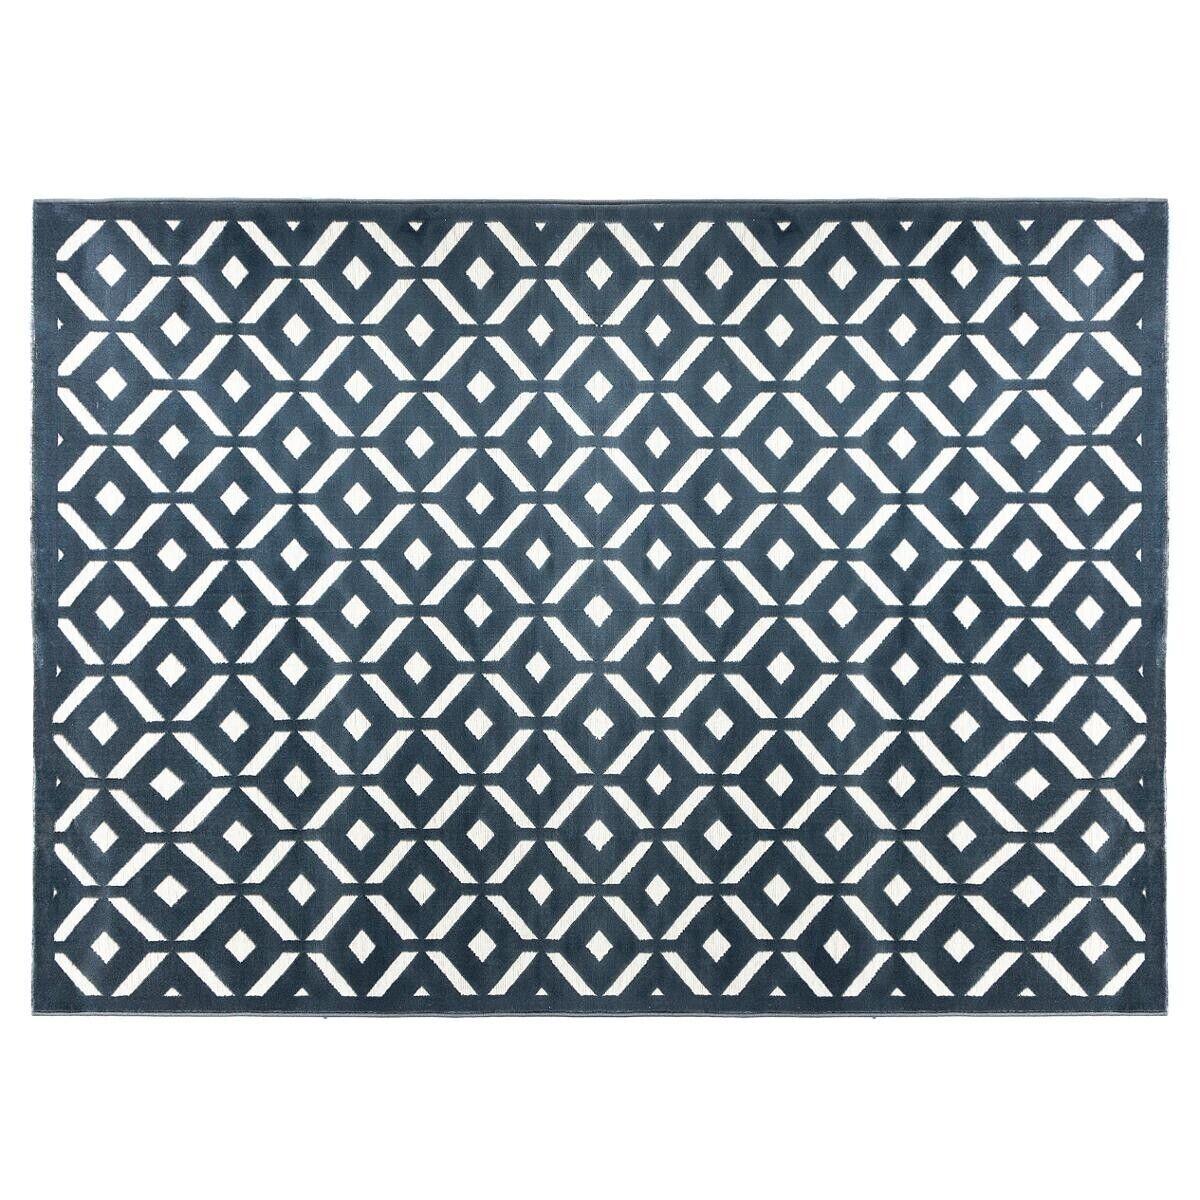 "Atmosphera Tapis ""Relief"" losange bleu et blanc 160x230 cm"